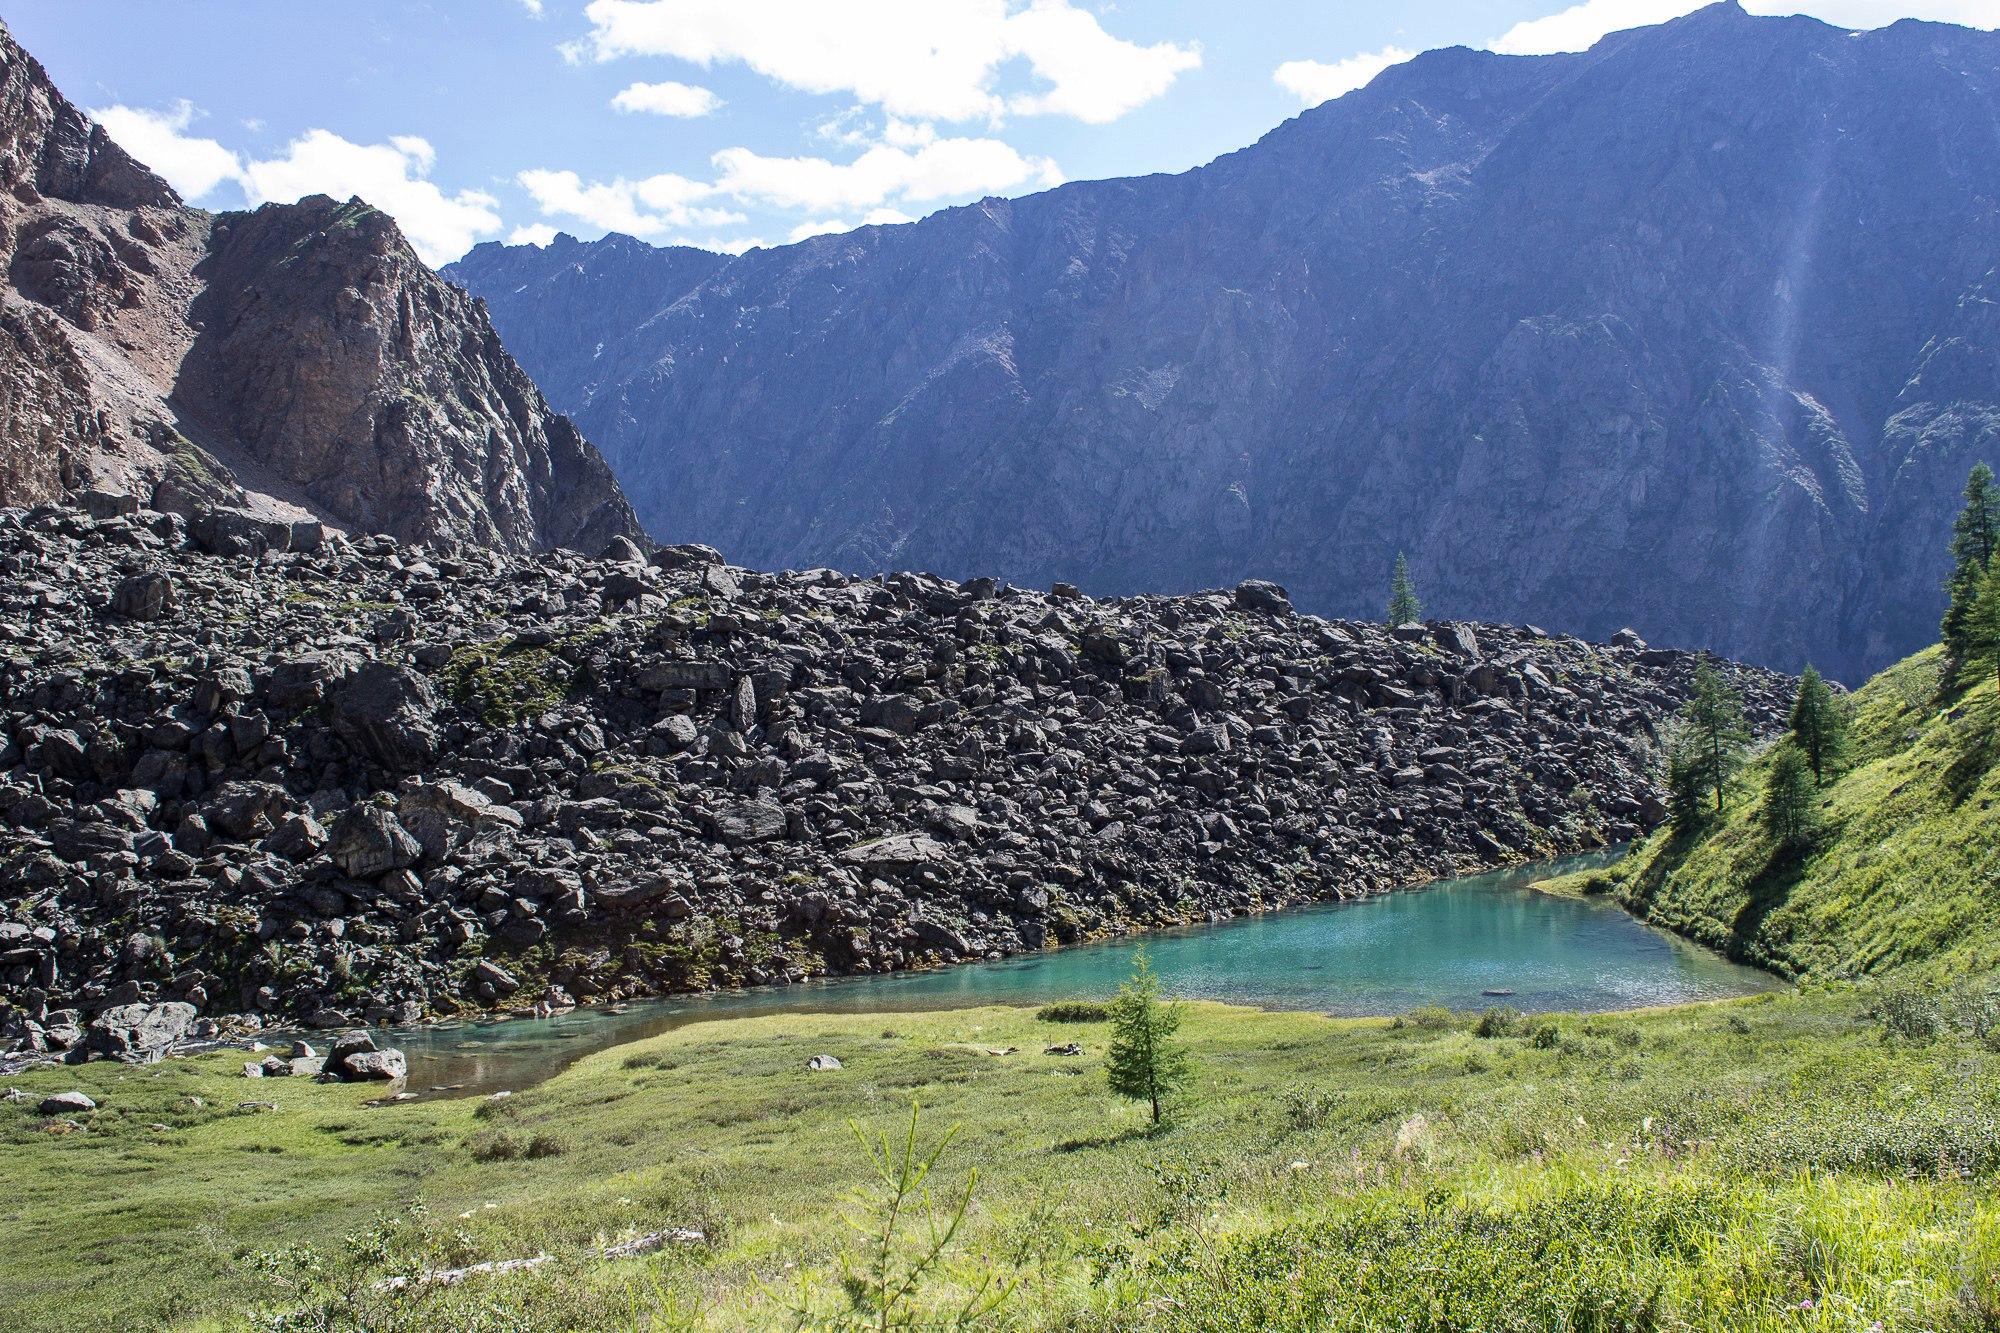 Озерцо на подъеме к Нижнему Шавлинскому перевалу